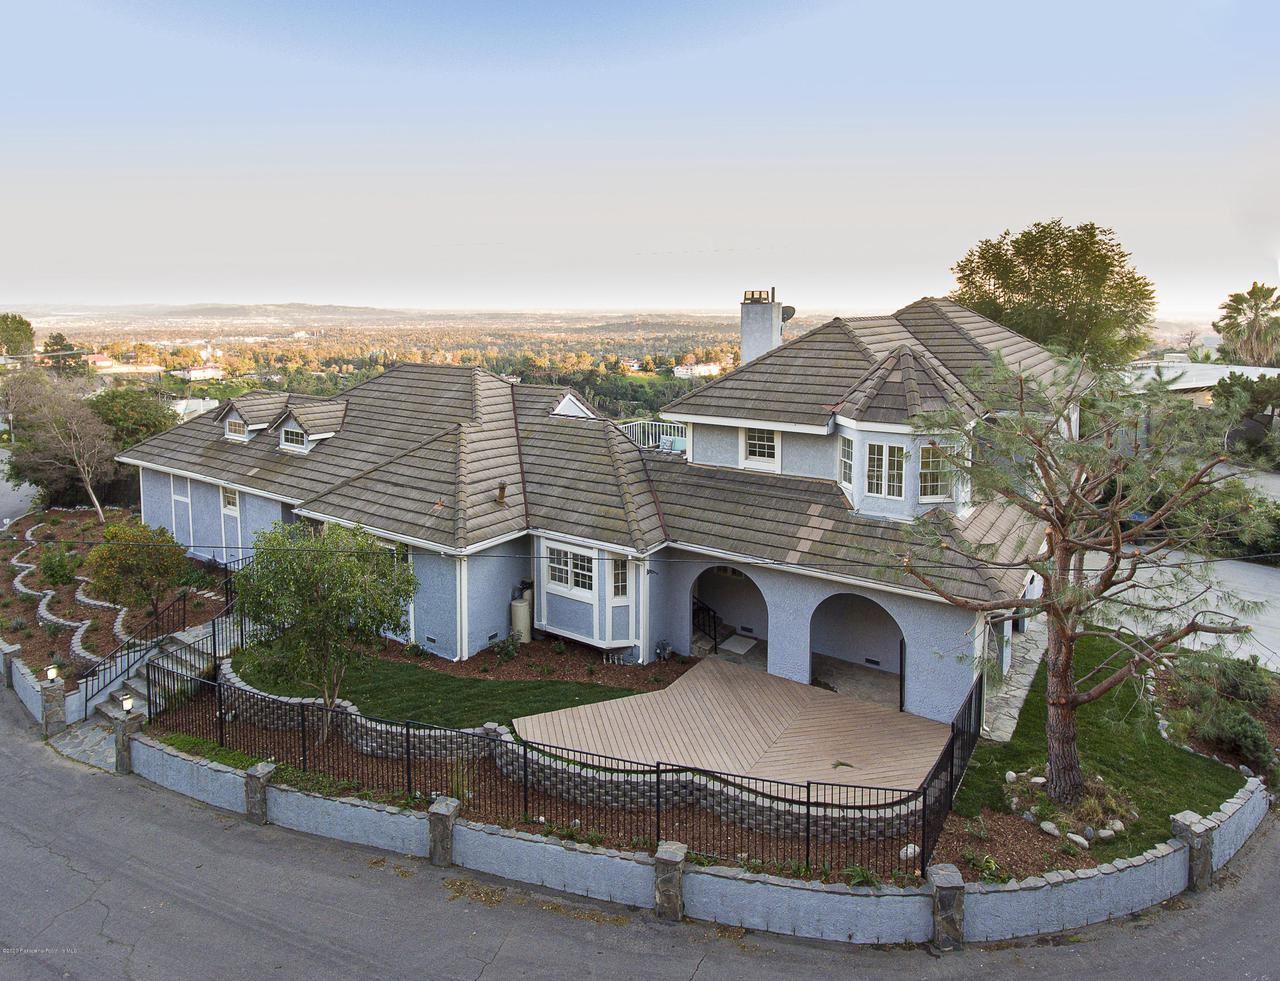 Photo of 1580 GLEN OAKS Boulevard, Pasadena, CA 91105 (MLS # 820000591)